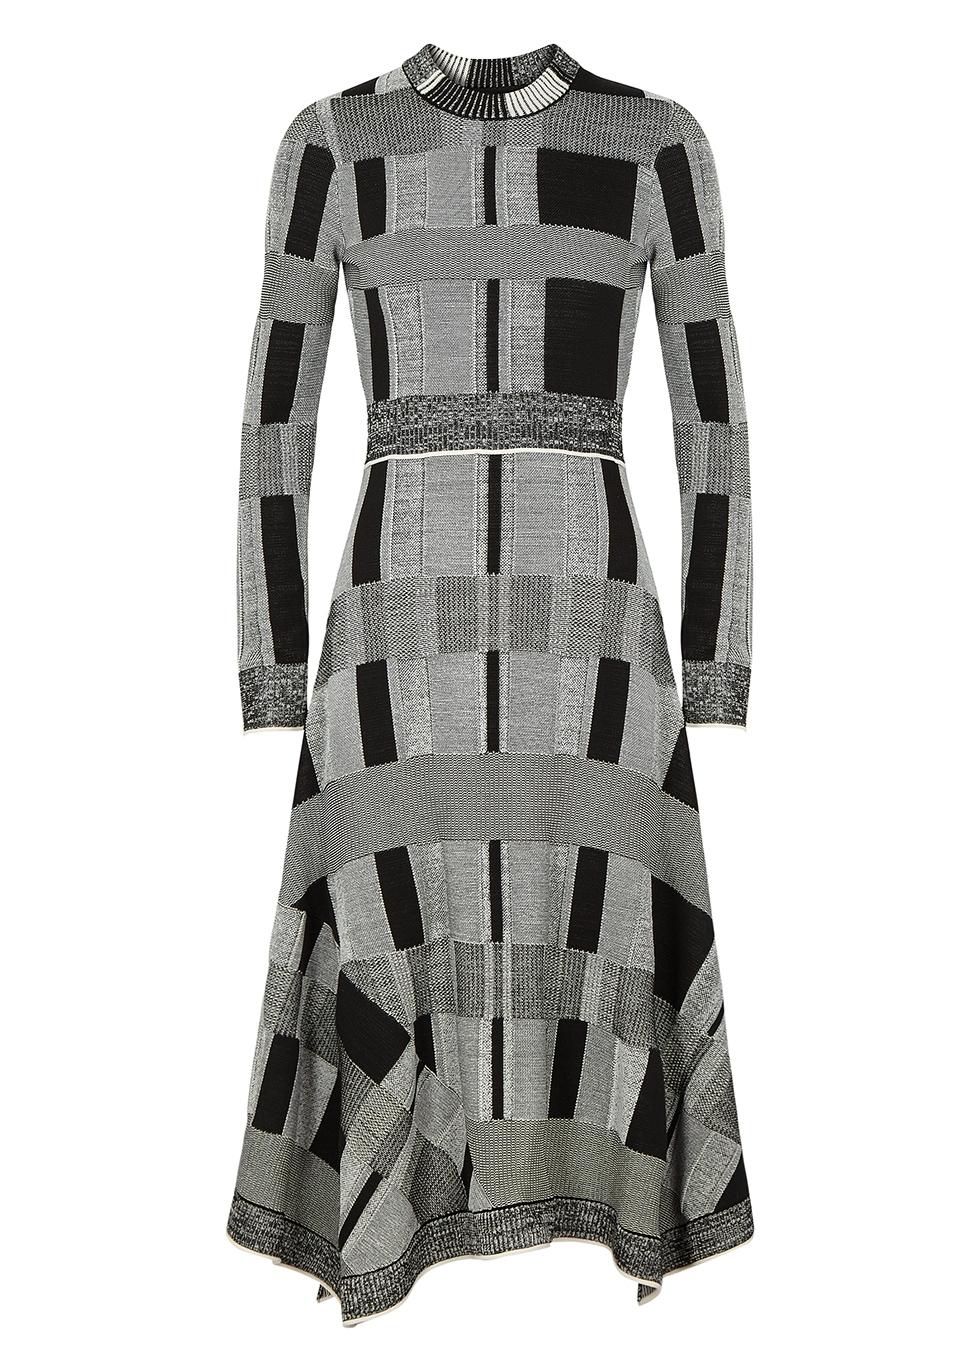 b36d6b16 Designer Dresses & Designer Gowns - Harvey Nichols